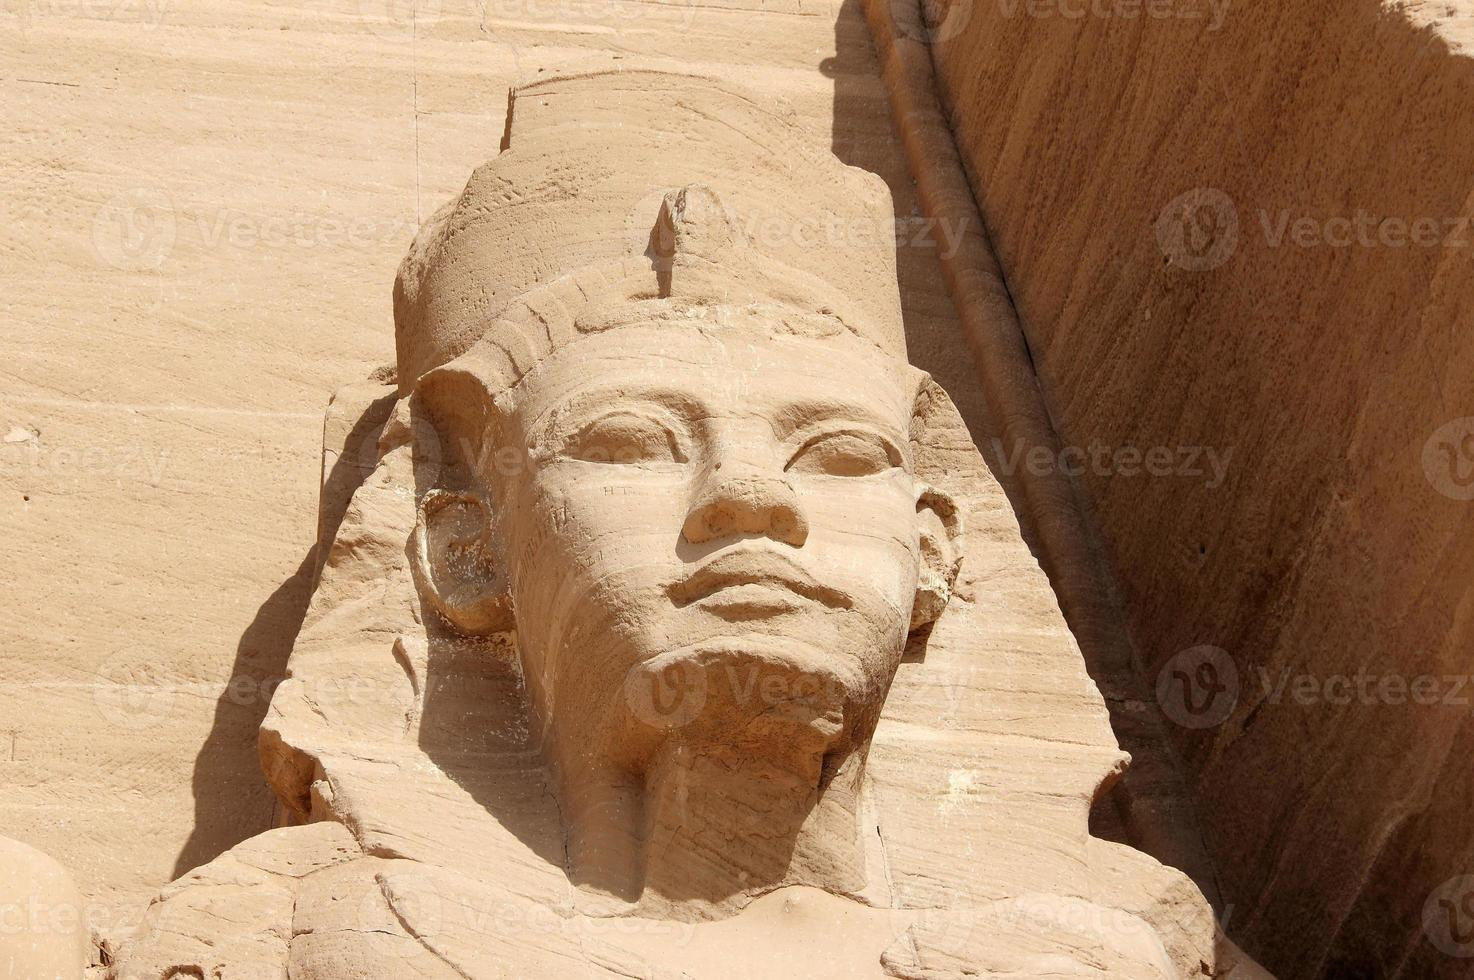 dettaglio temple of rameses ii. abu simbel, egitto. foto